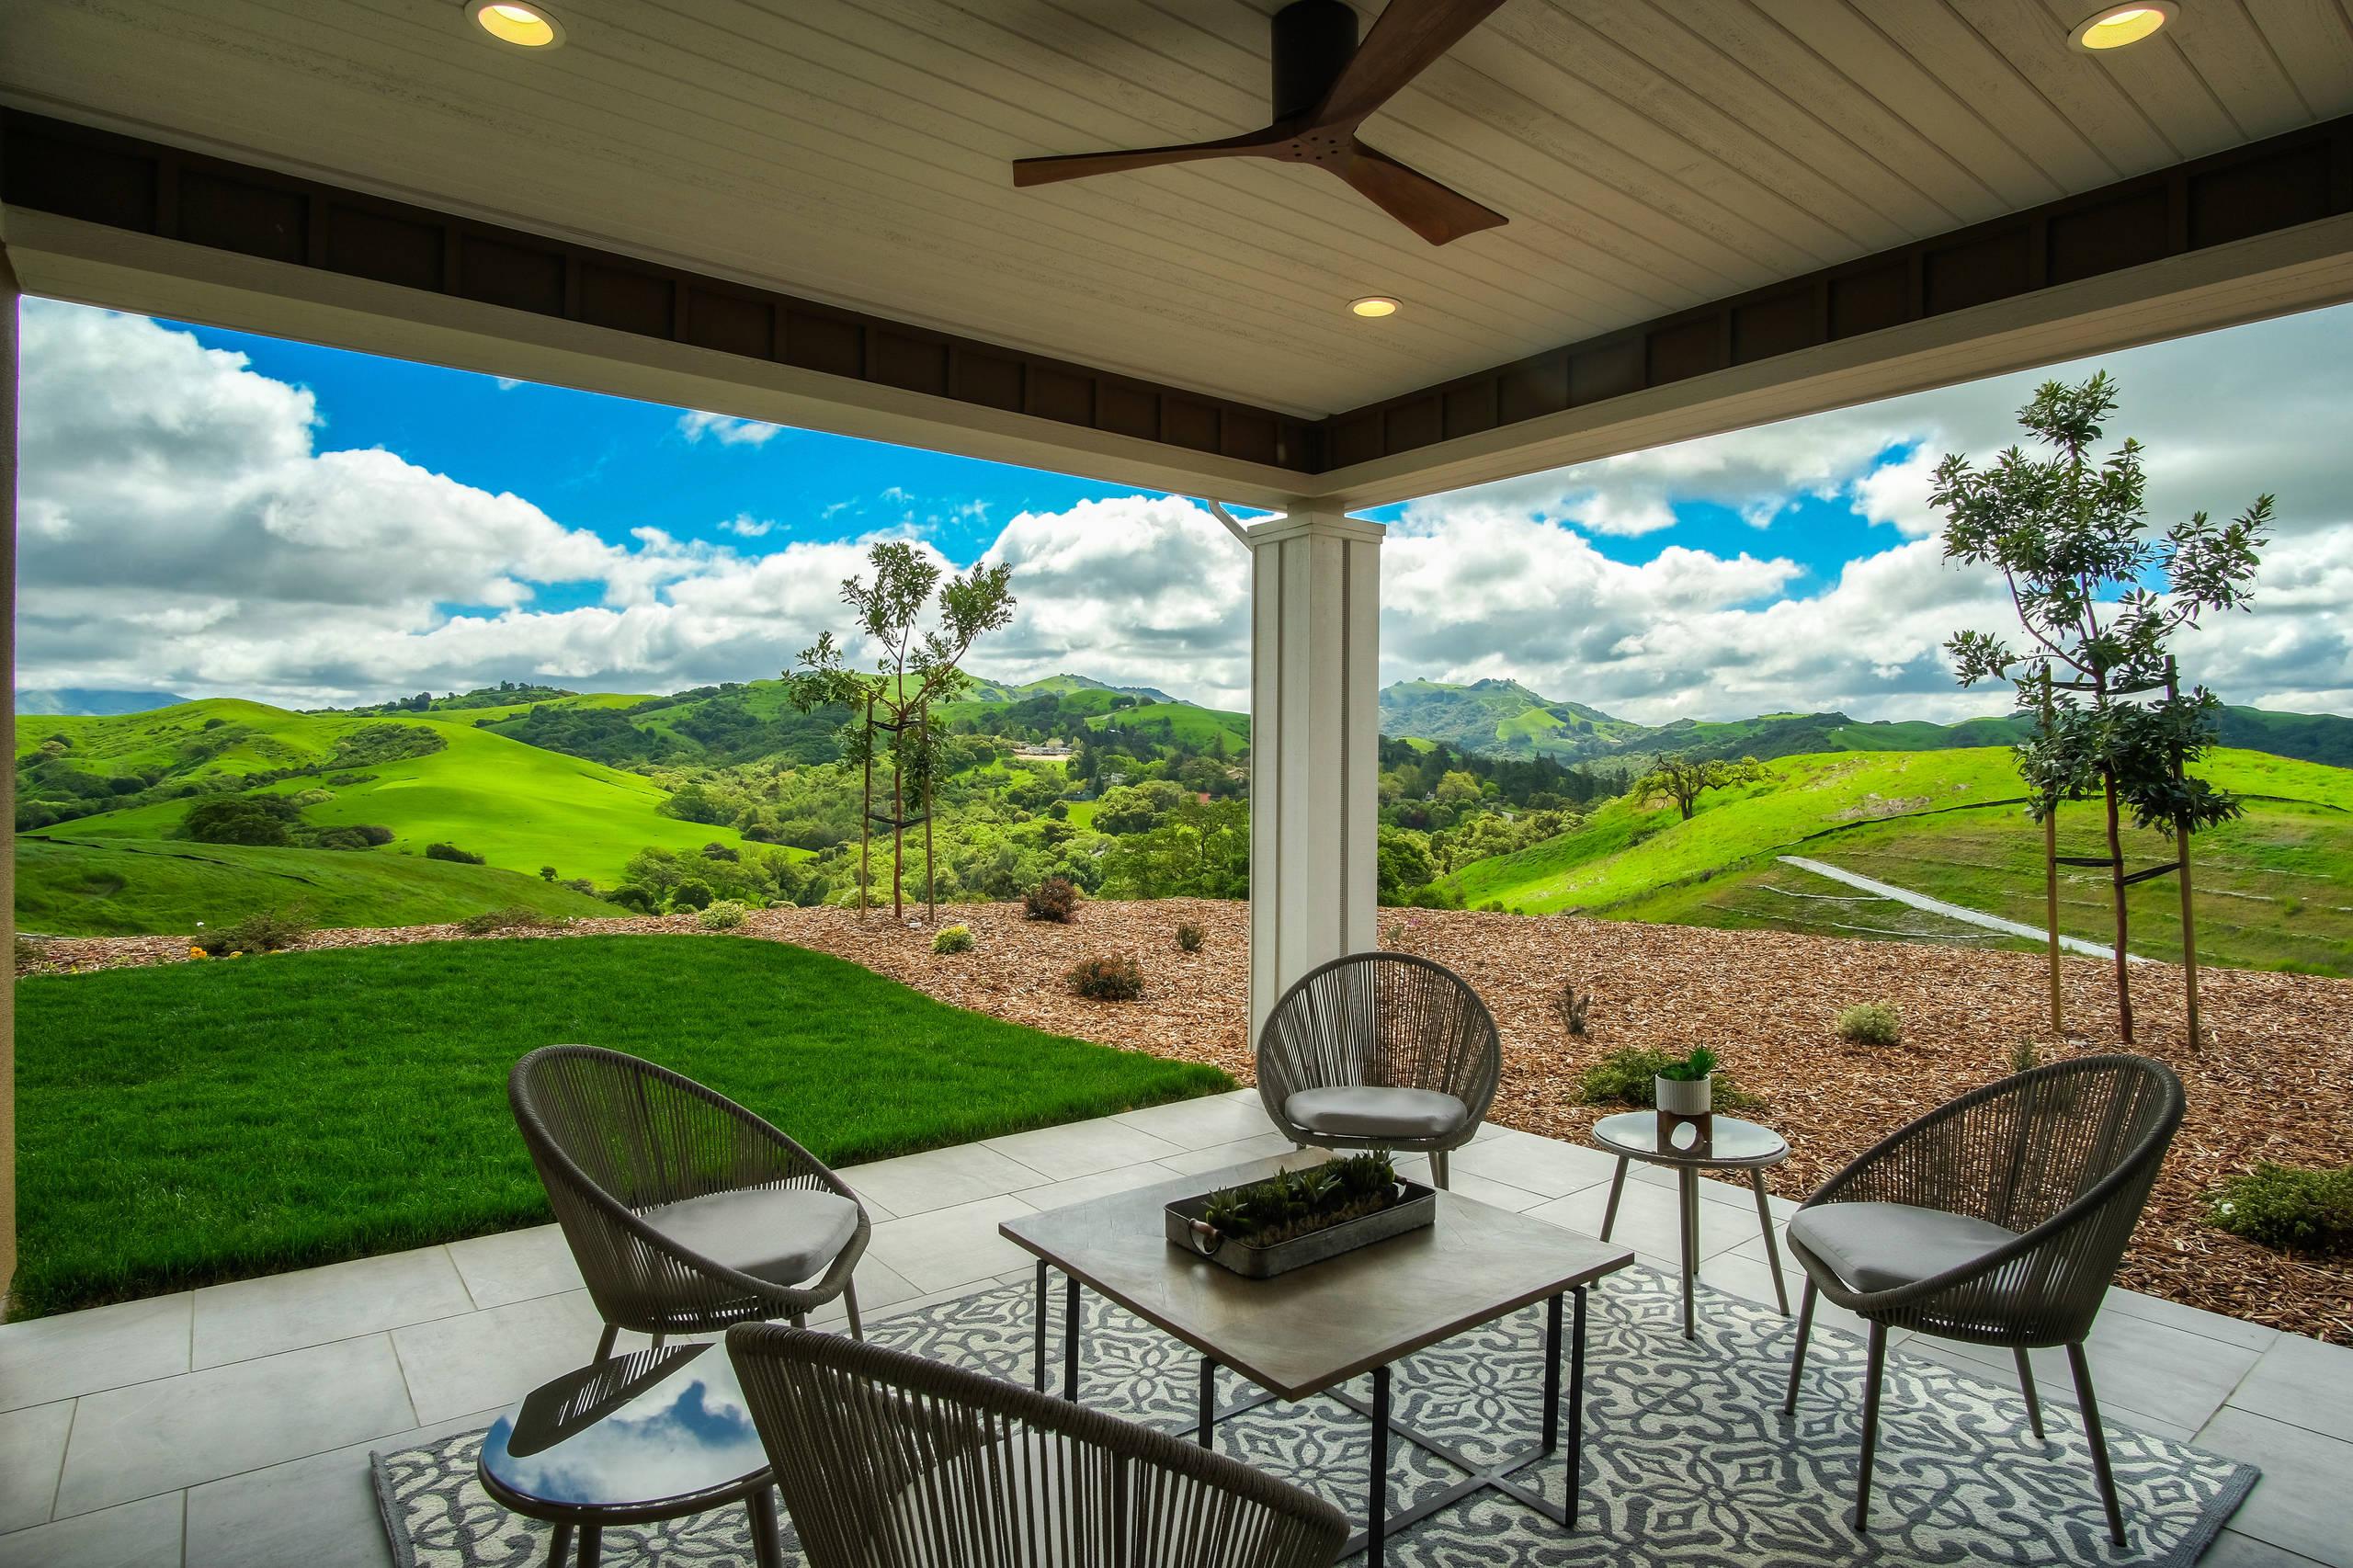 bellavista by summerhill homes